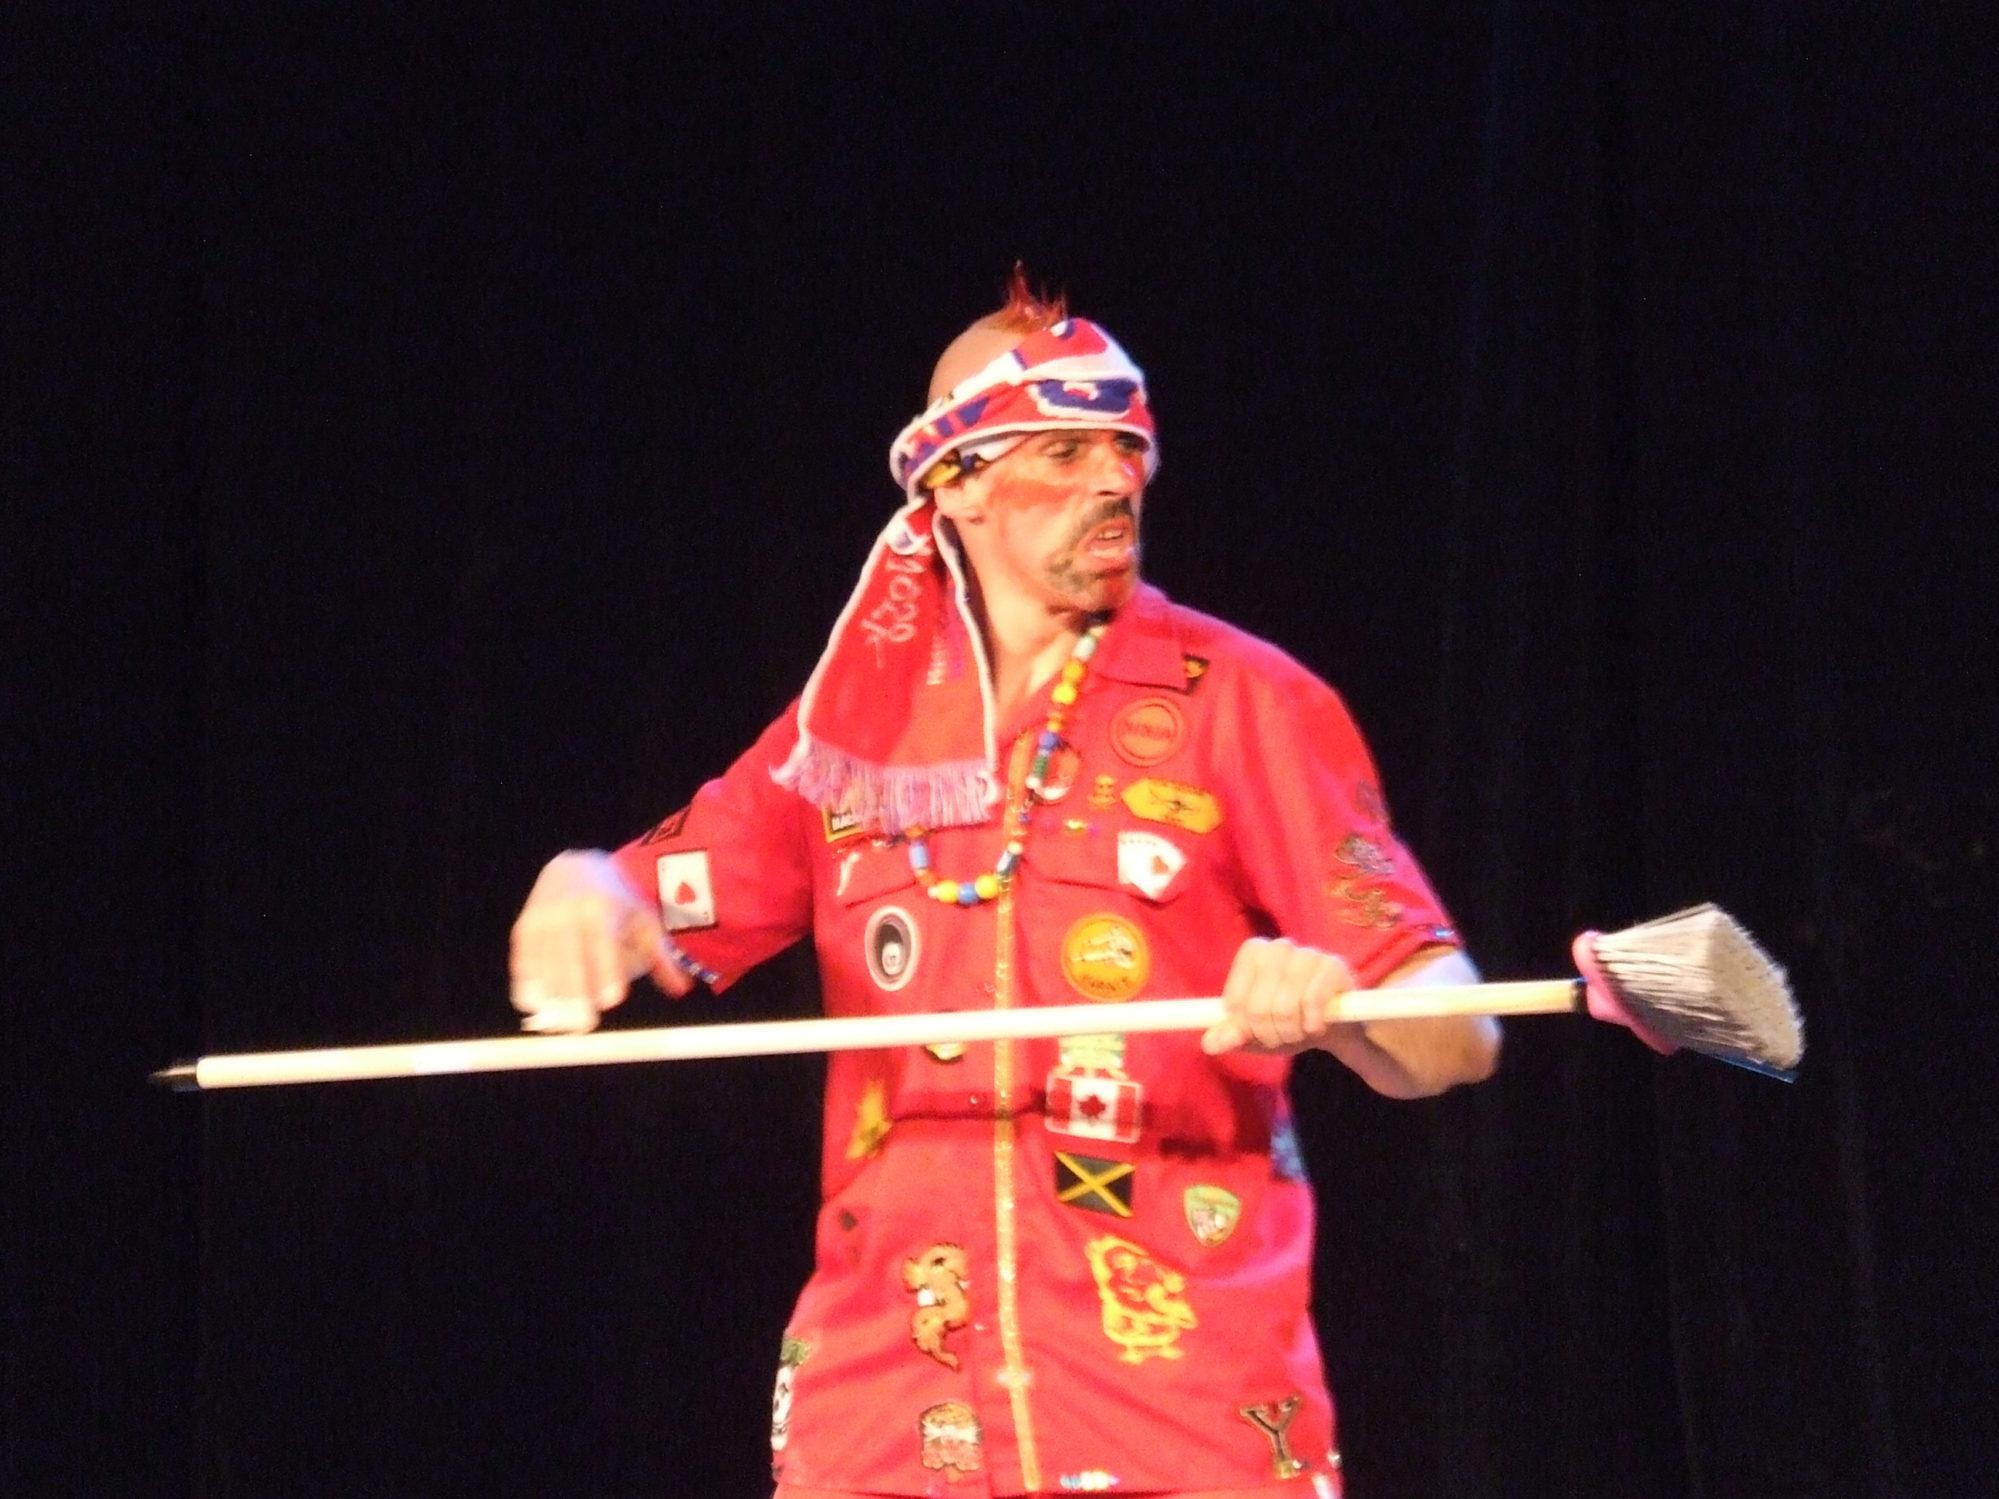 steven ninja nase clown